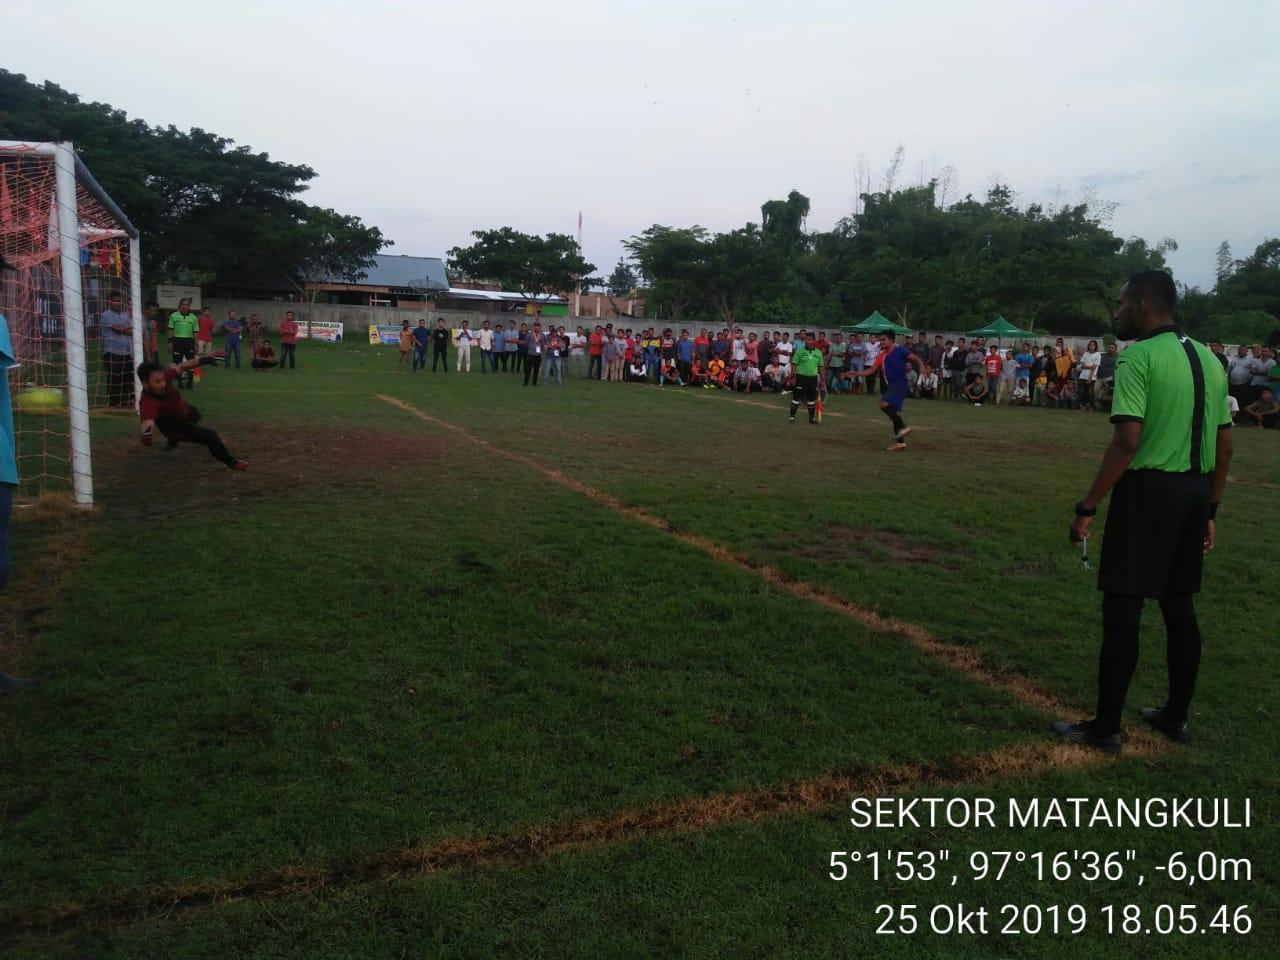 Kapolsek Cup II 2019 Matangkuli, PS TJ Seureukui vs PSKP Alue Bing